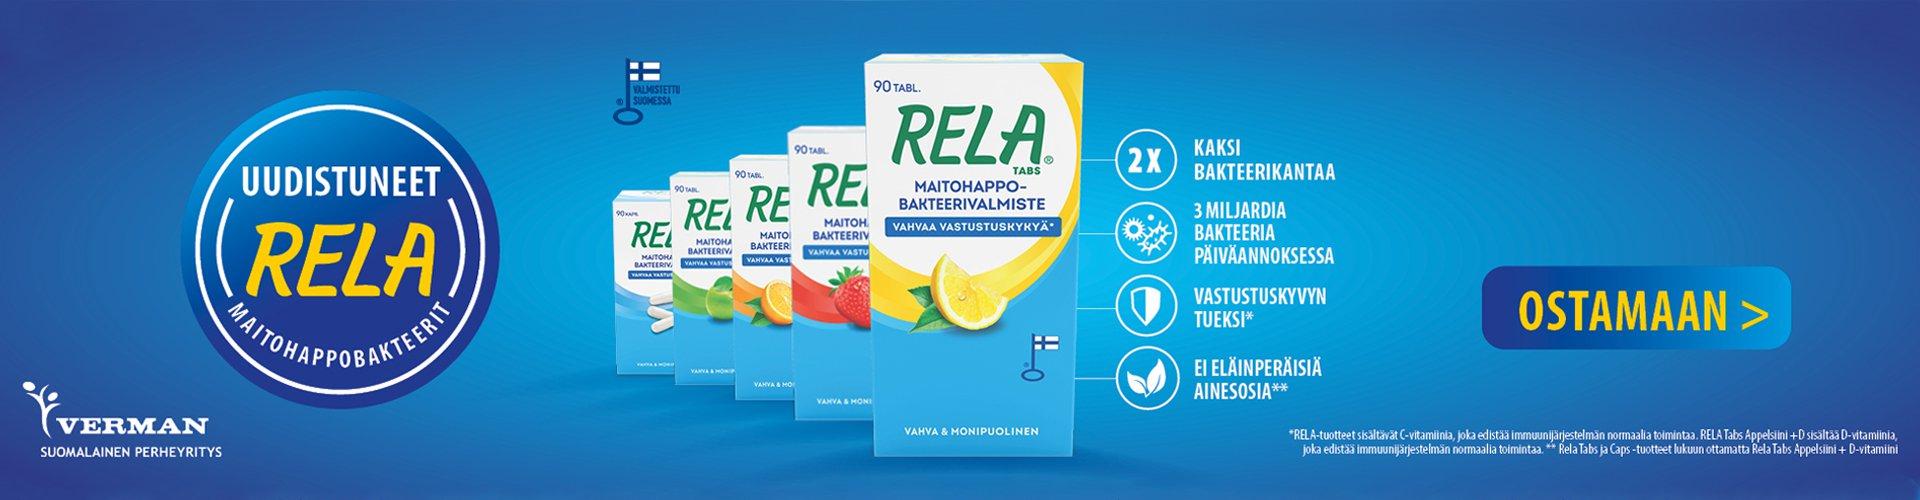 Uudistunut Rela maitohappobakteeri